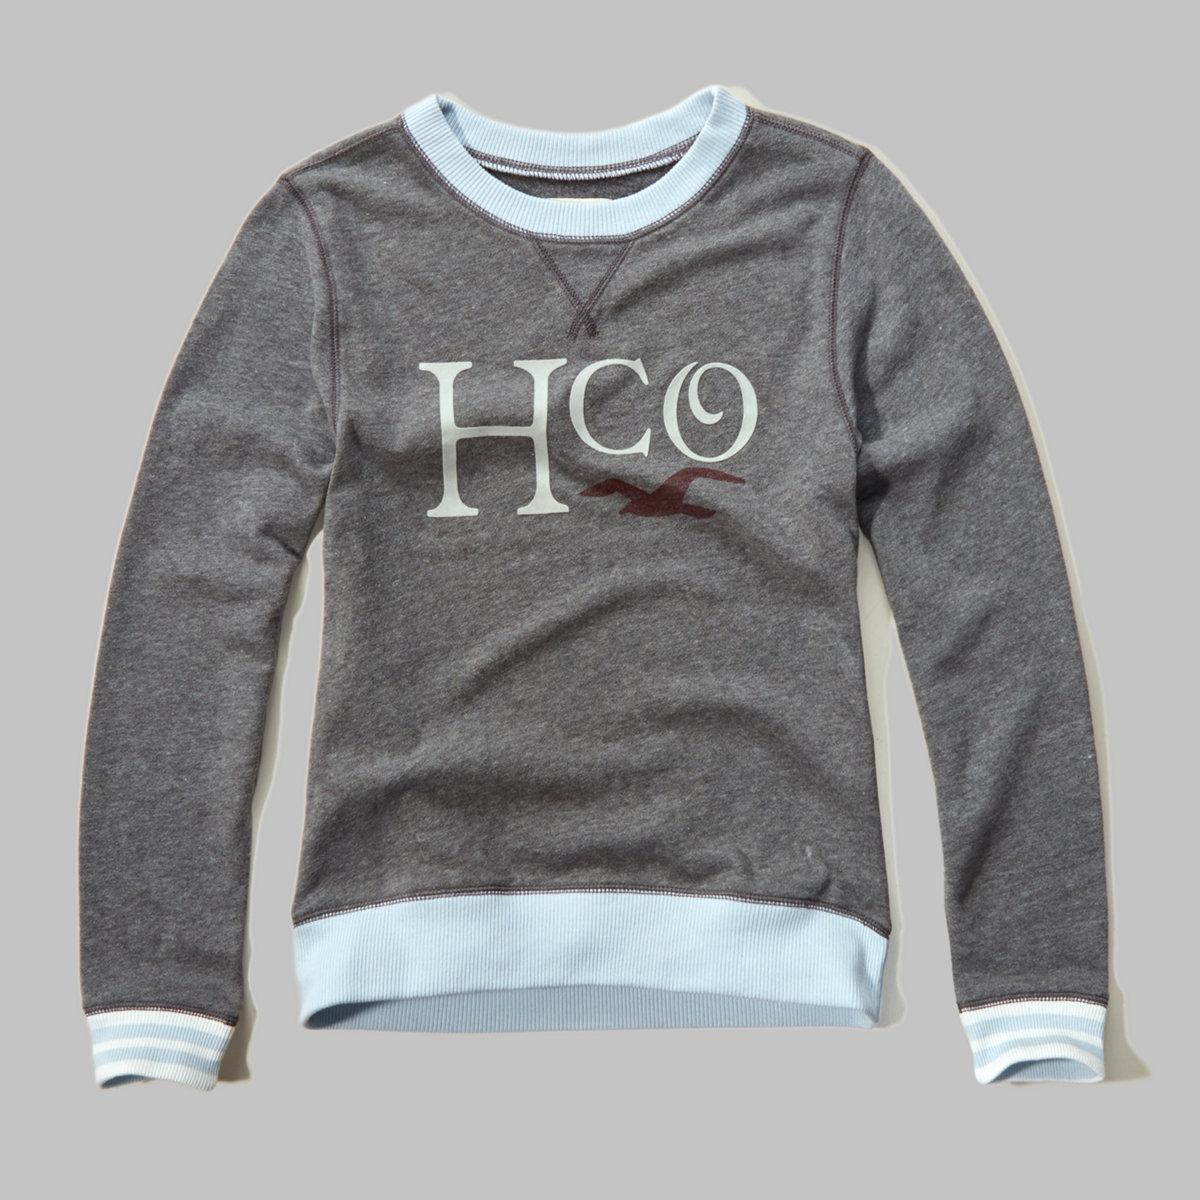 Flocked Graphic Sweatshirt